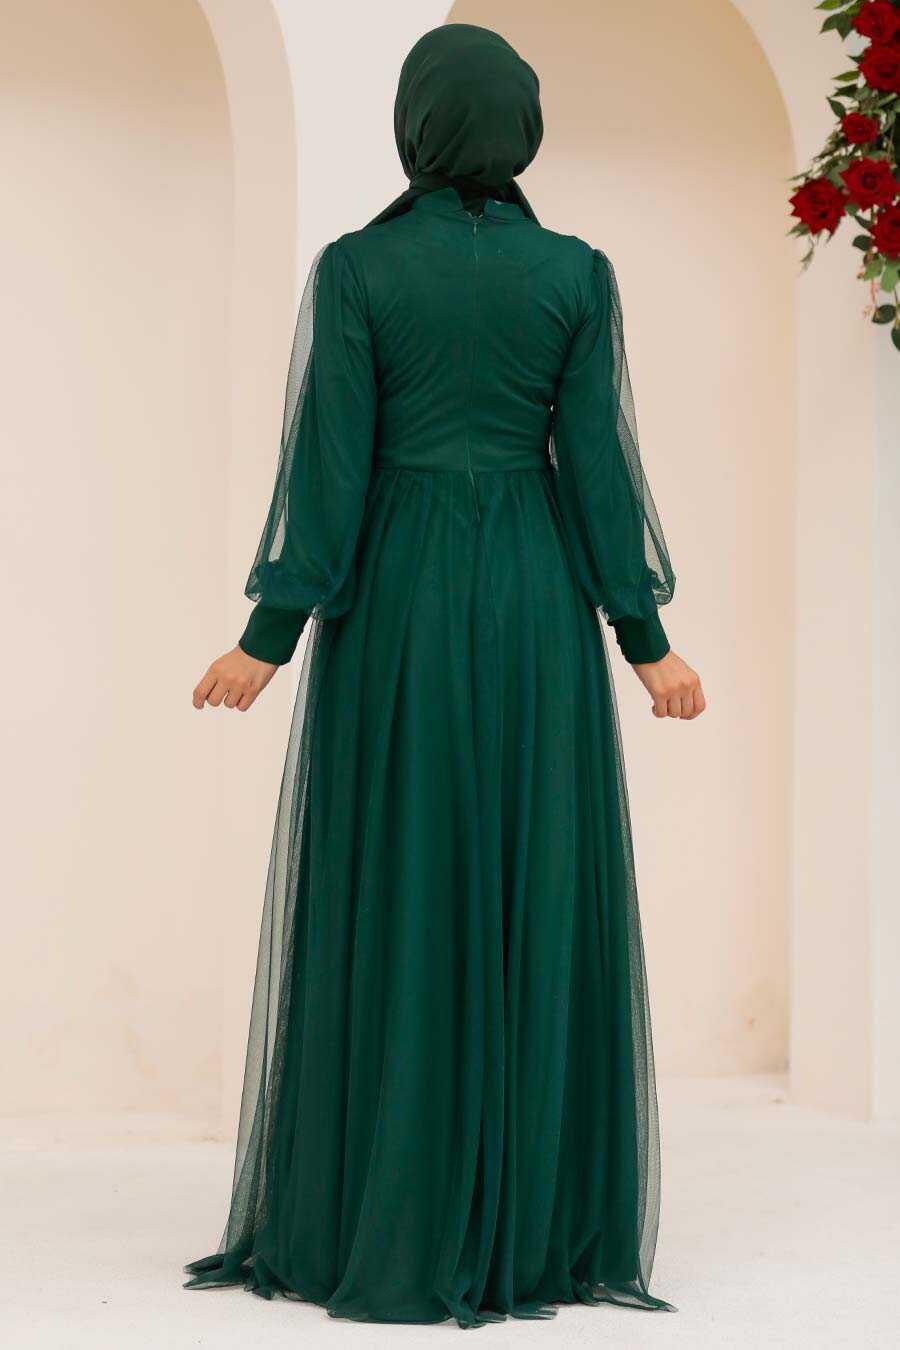 Green Hijab Evening Dress 5478Y